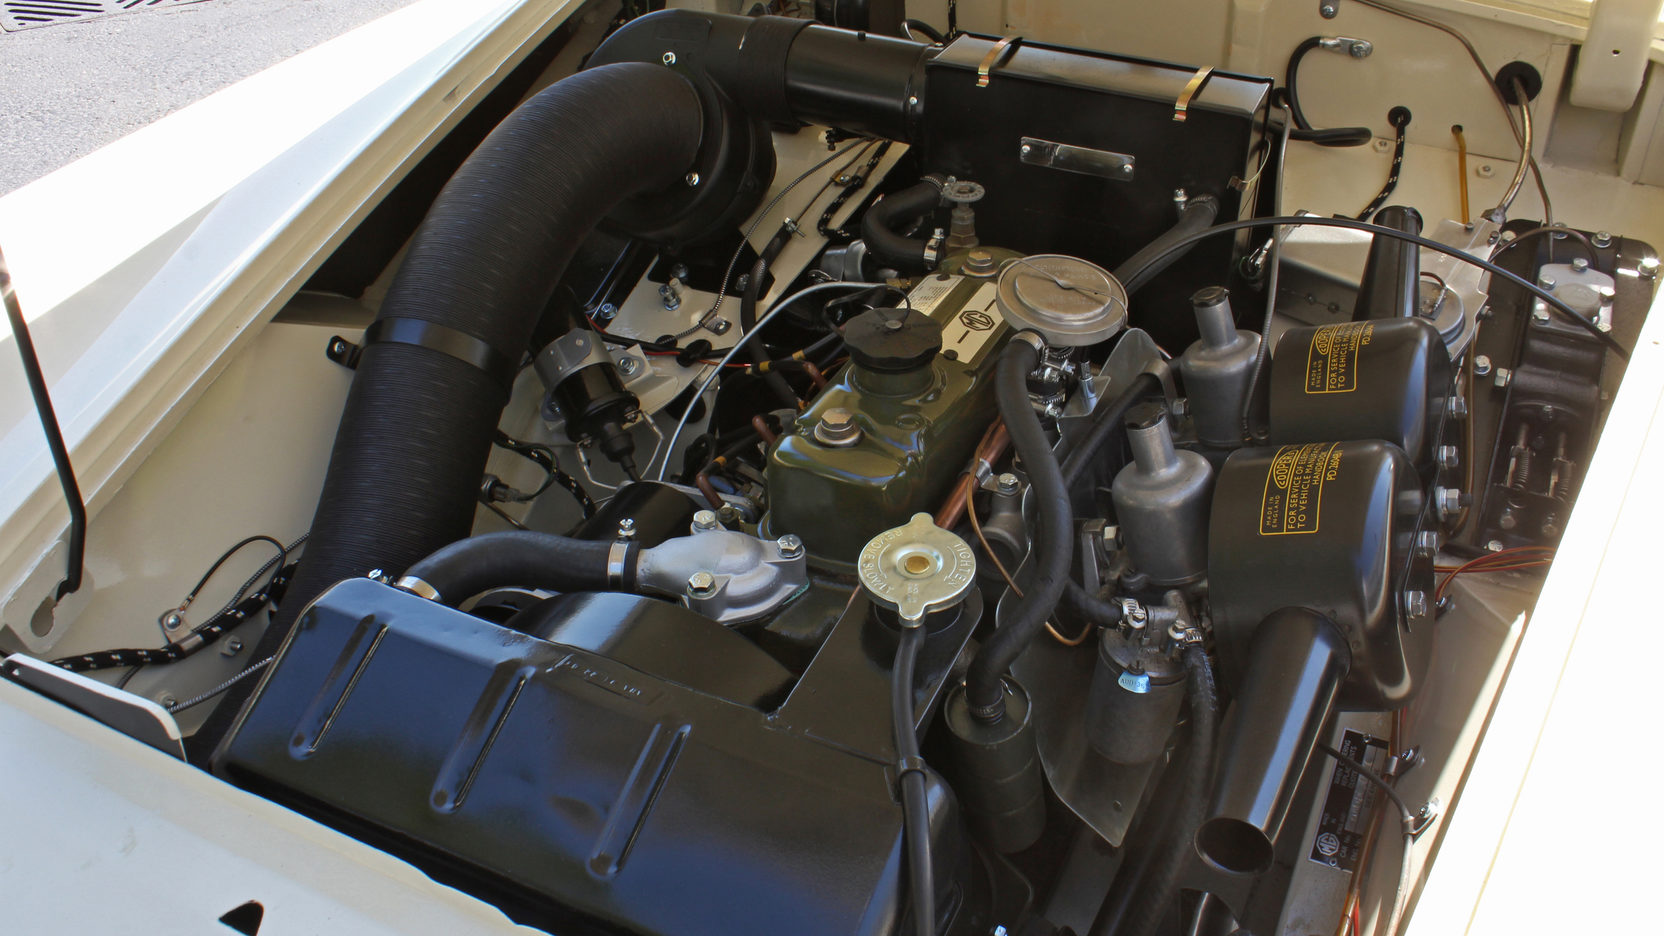 1965 MG Midget dual carb